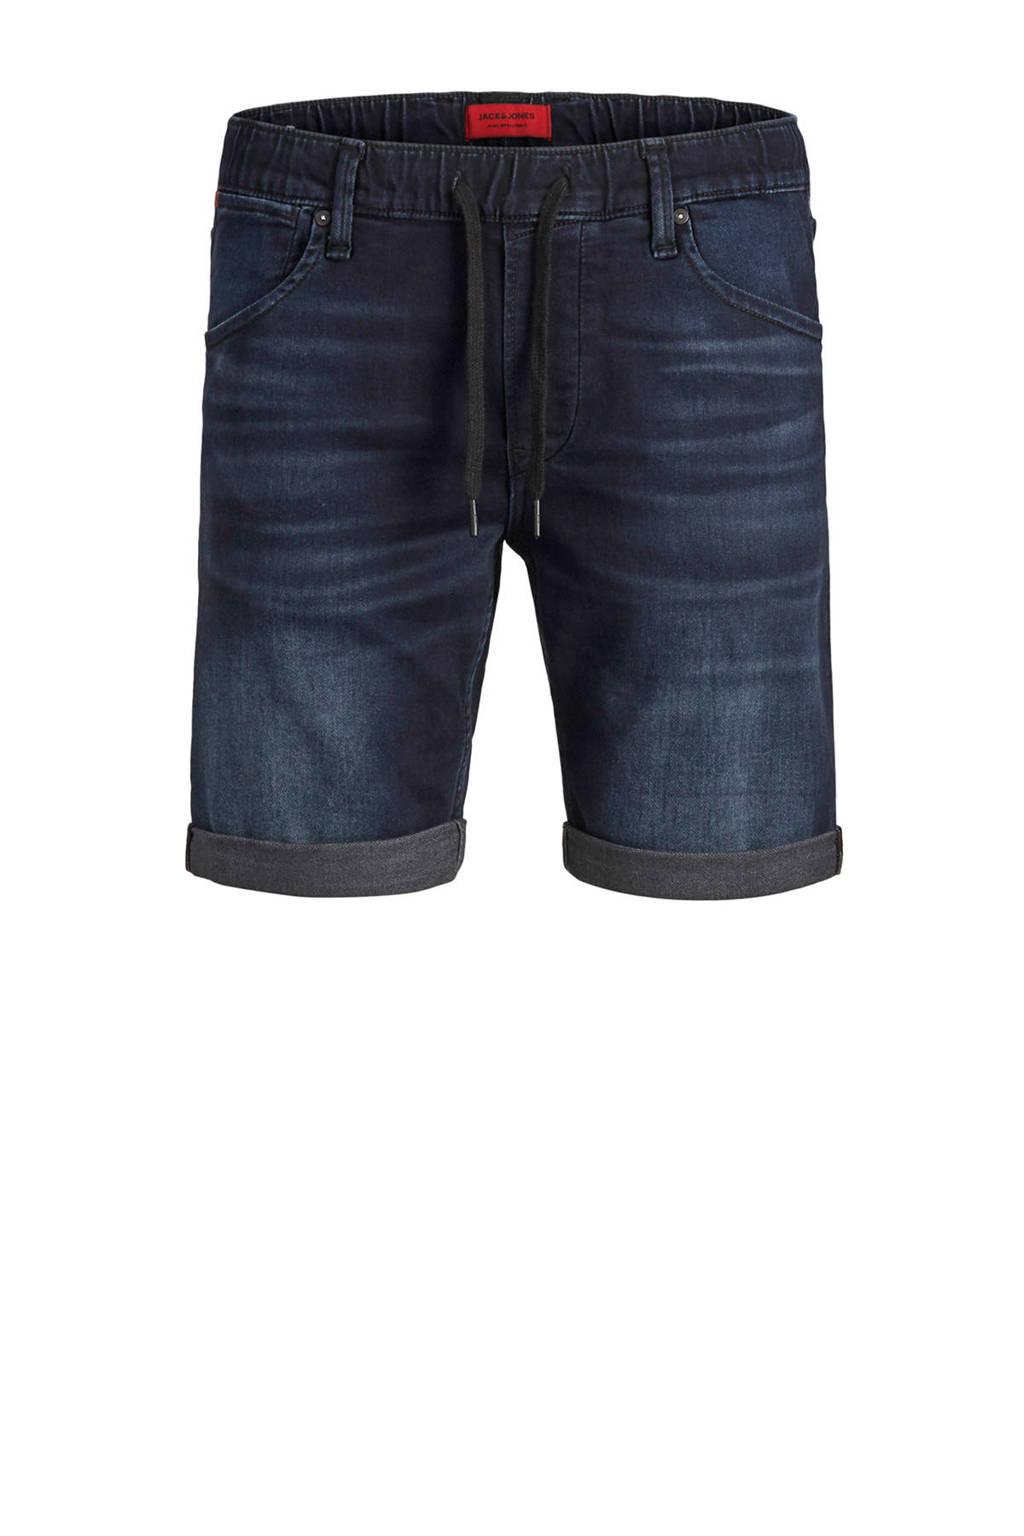 Jack & Jones Intelligence slim fit jeans short, Blue denim